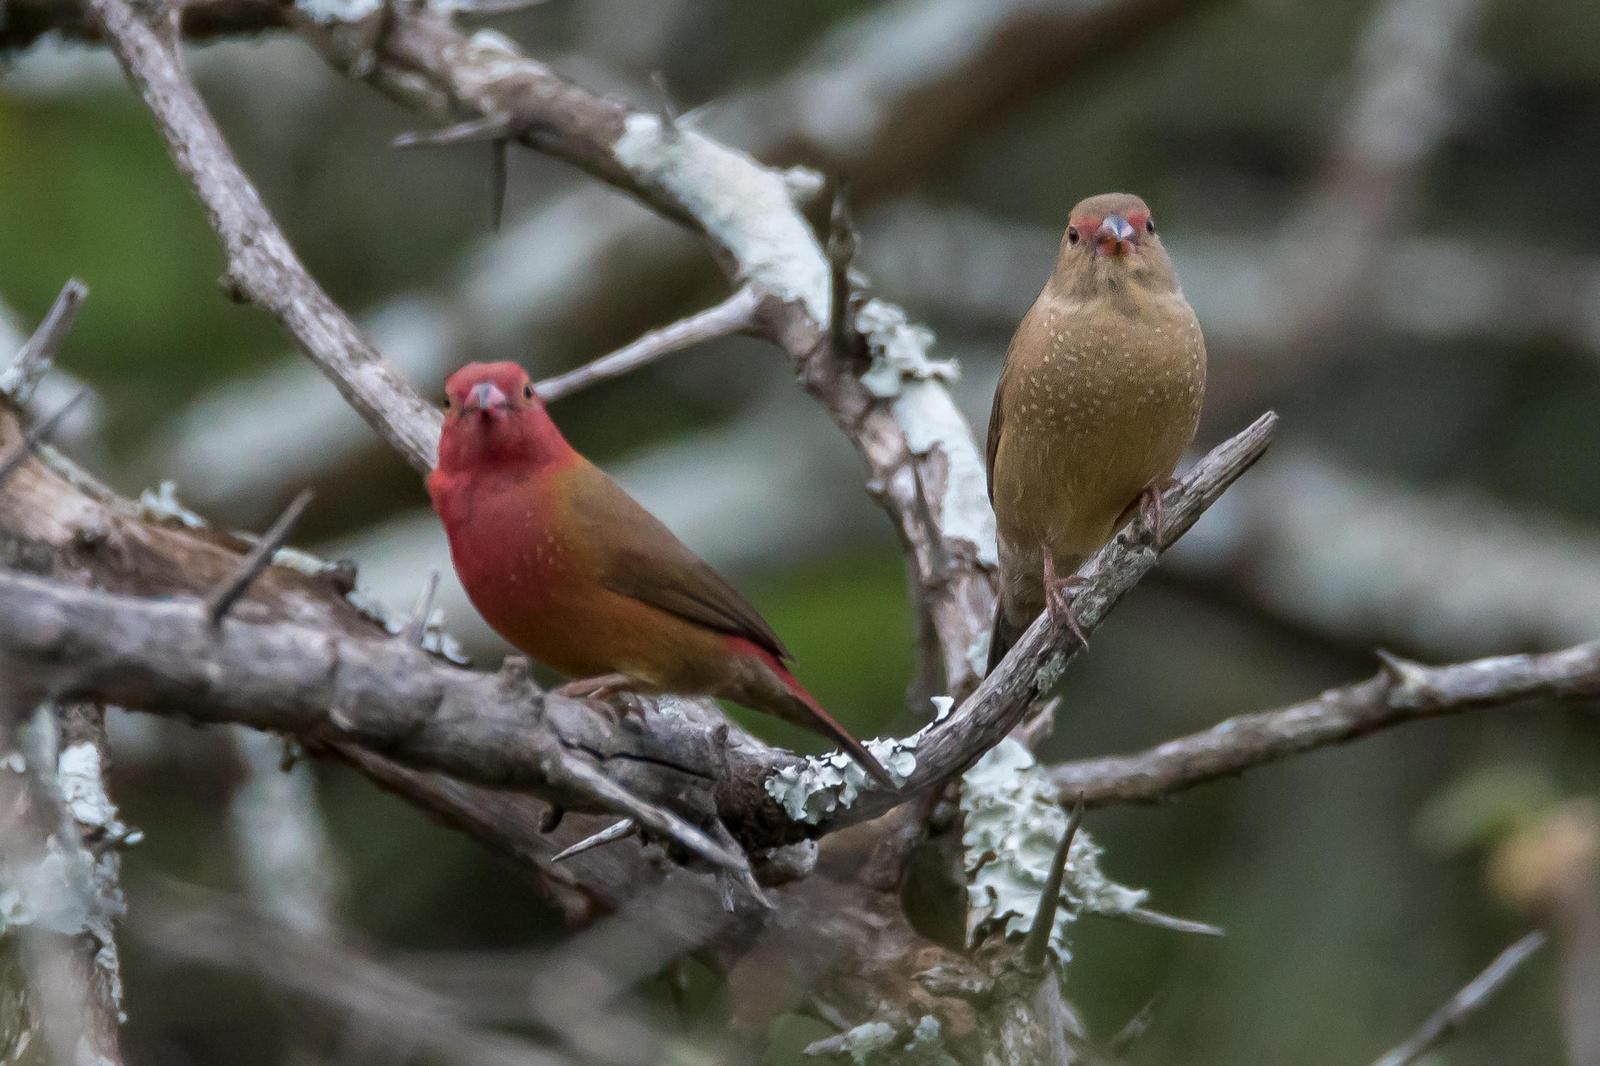 Red-billed Firefinch Photo by Gerald Hoekstra